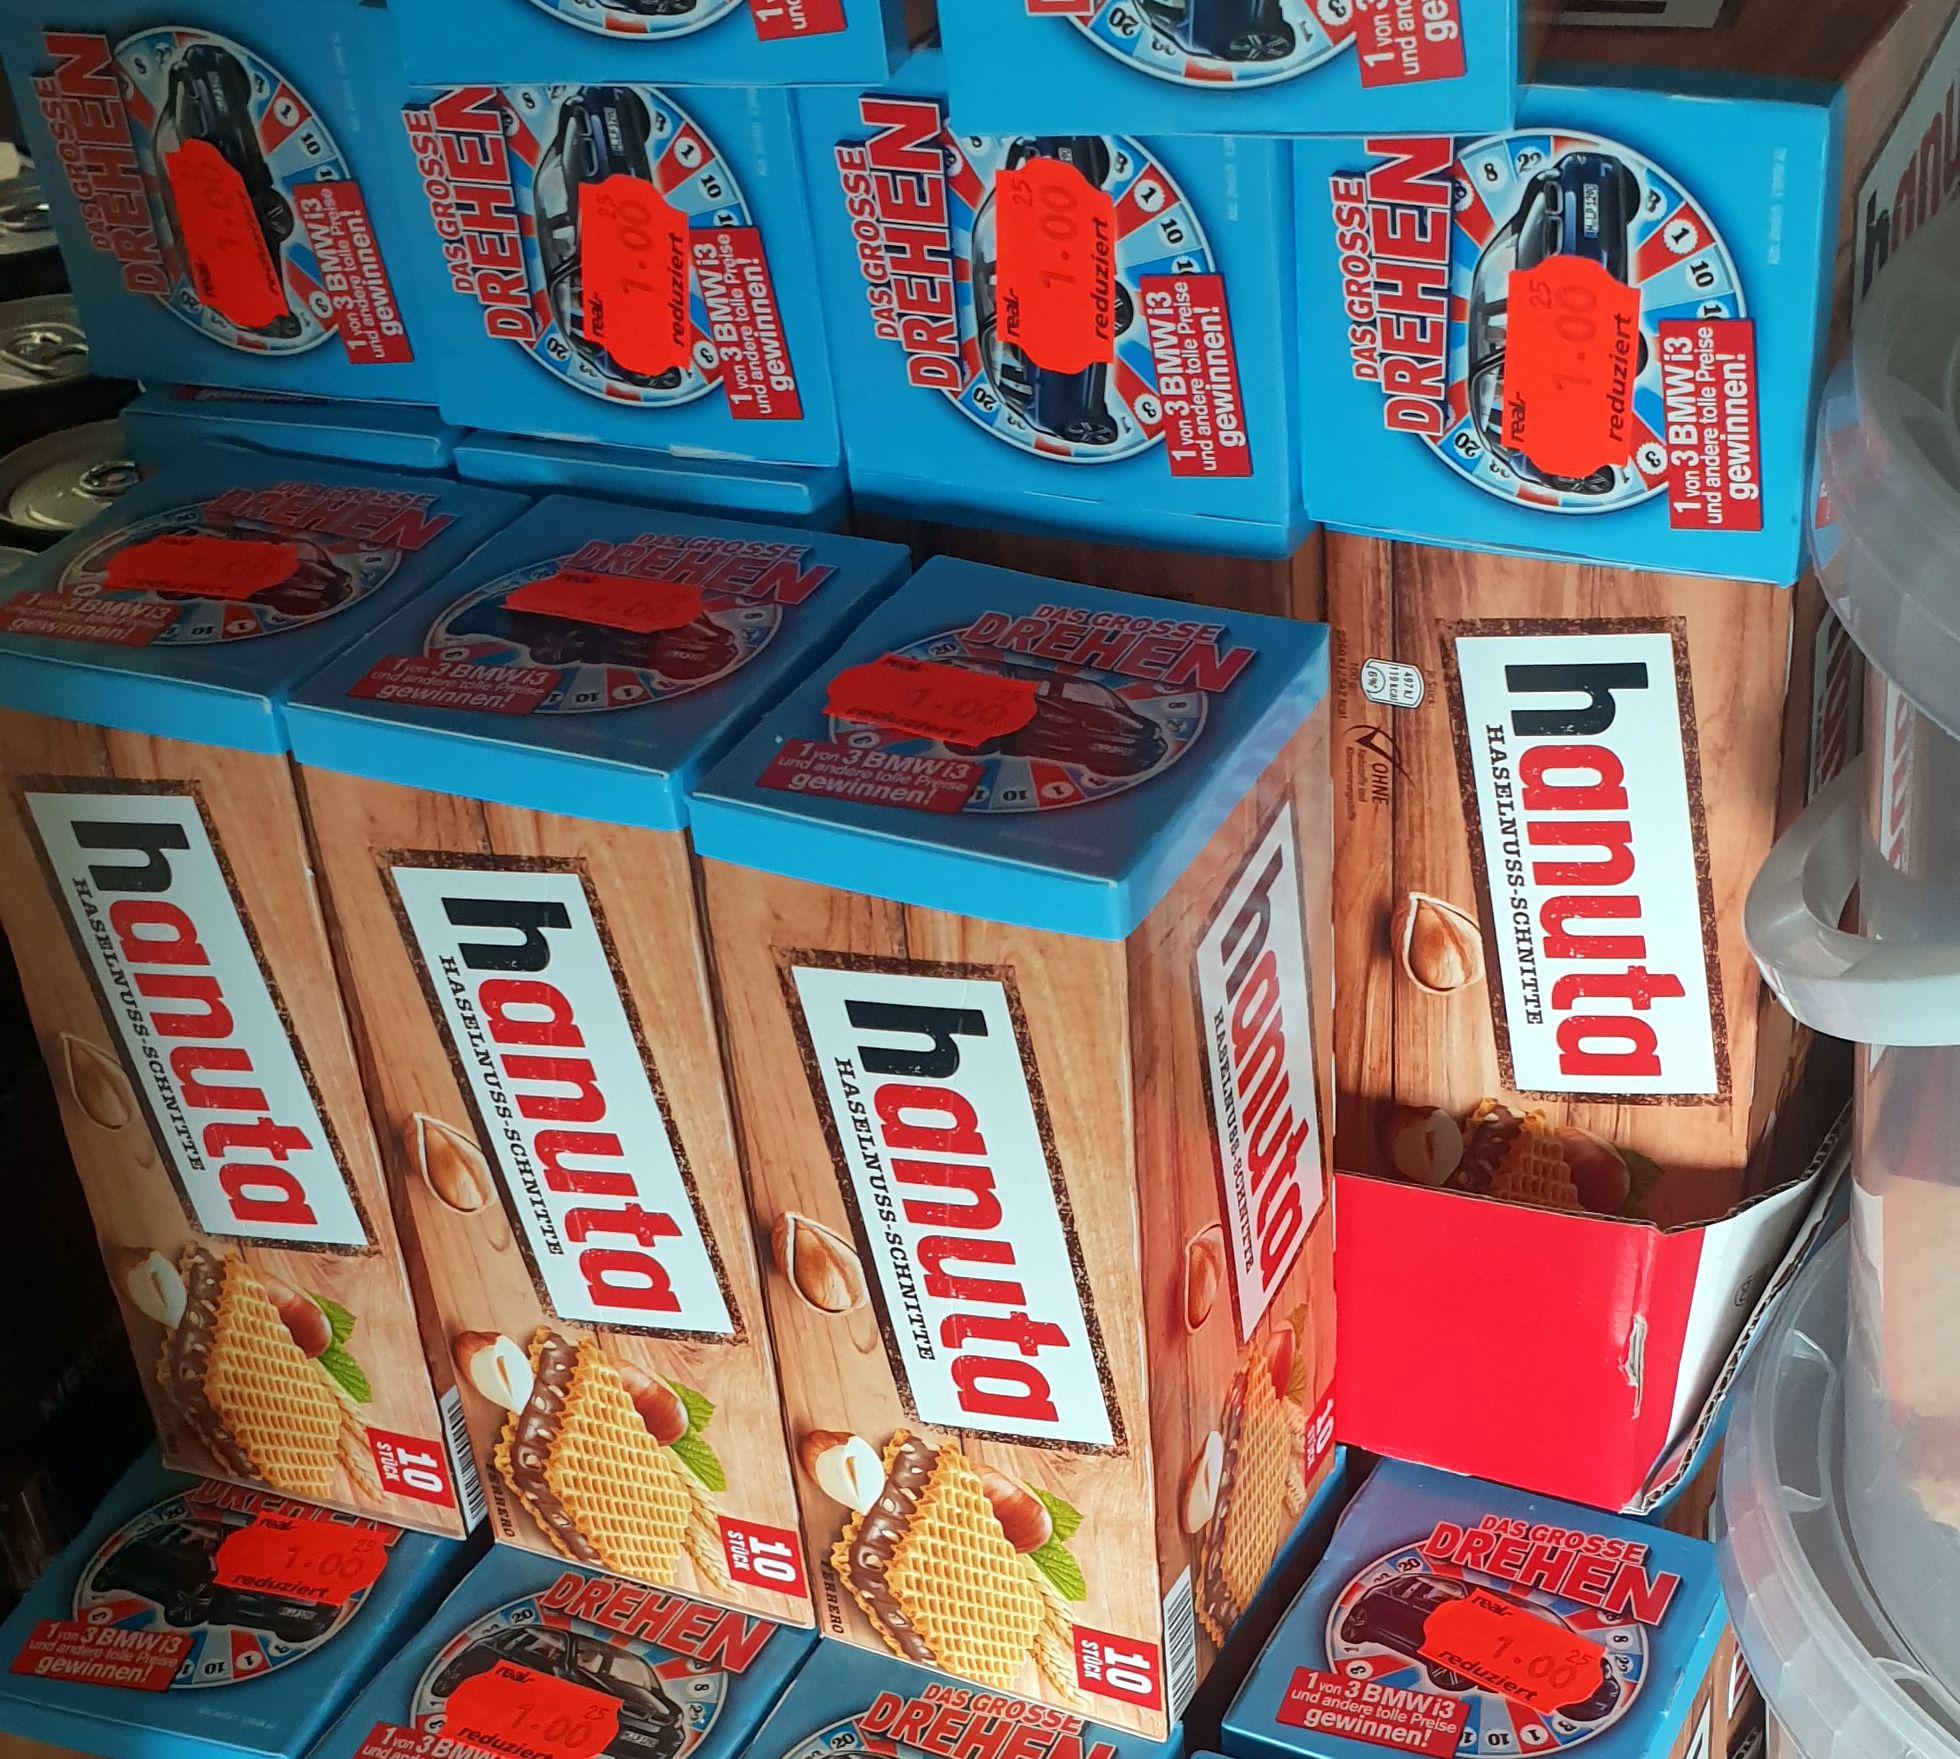 [Gross-Gerau] Real: 3er Ü-Eier / 10er Hanuta / Kinder Country / Nutella B-ready usw. für 1,00€